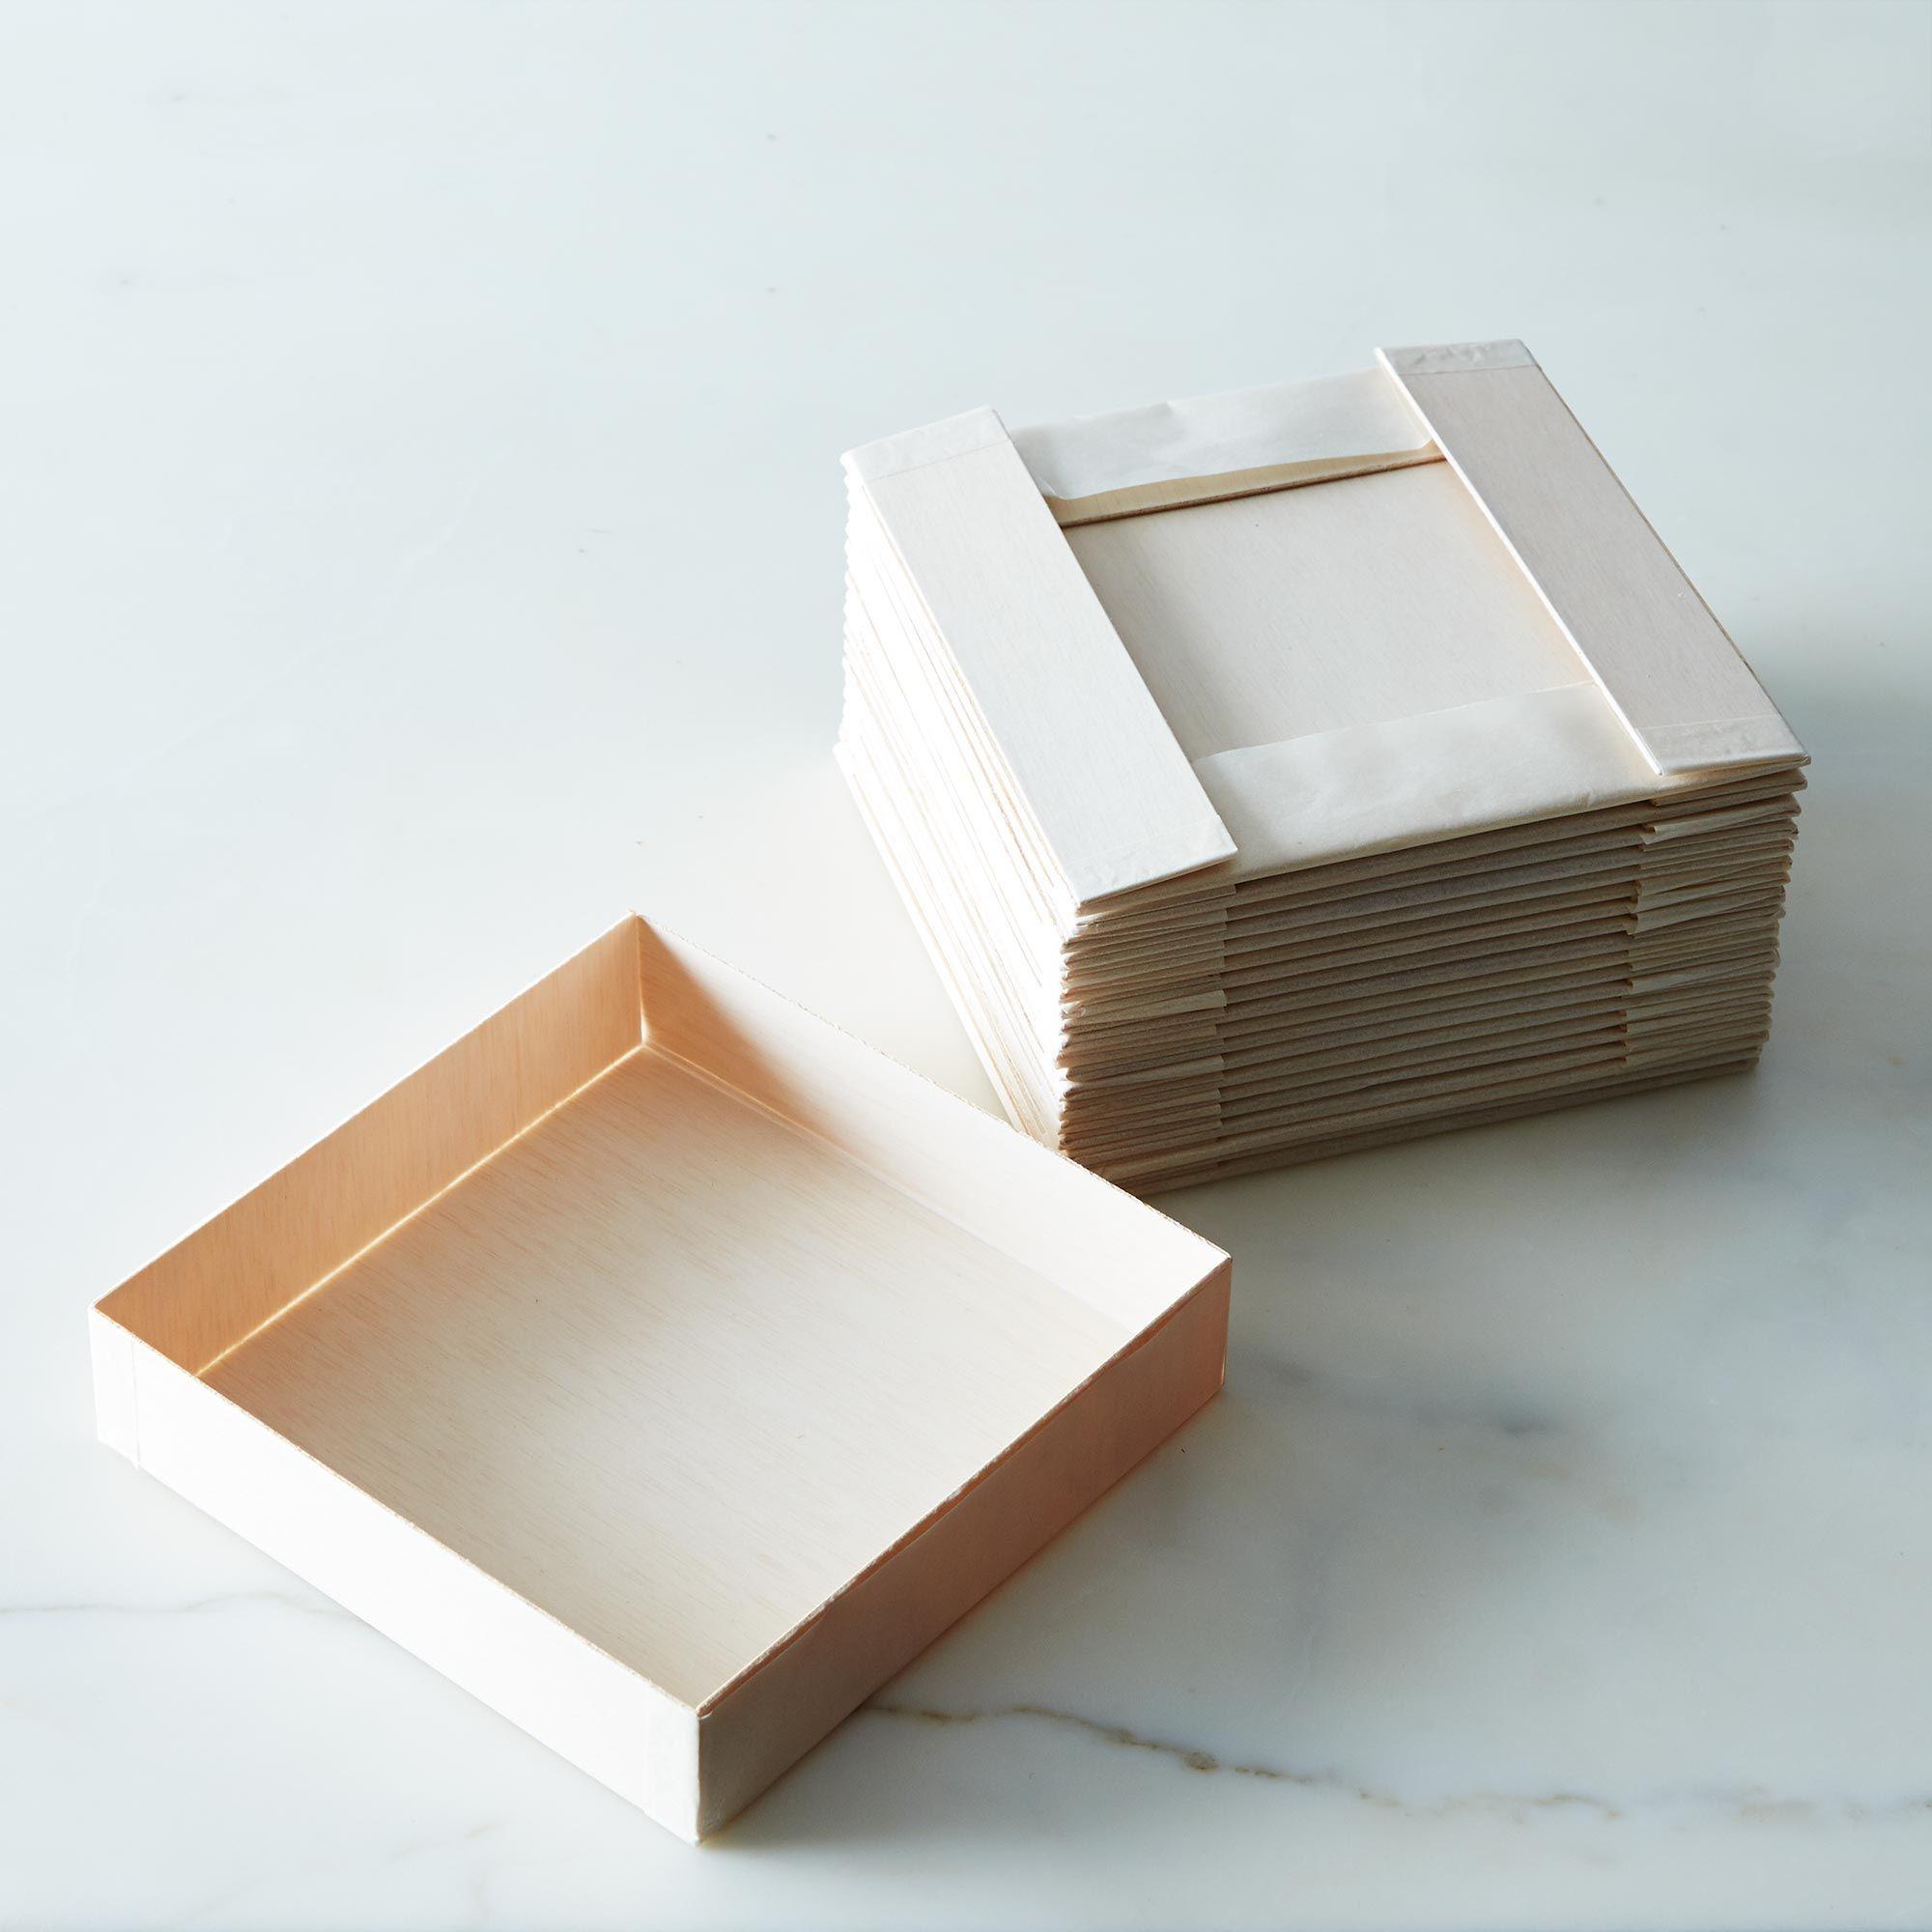 14c31574 ffa8 49fe a593 a2d301082c79  2014 0724 verterra collapsable wooden plates 011